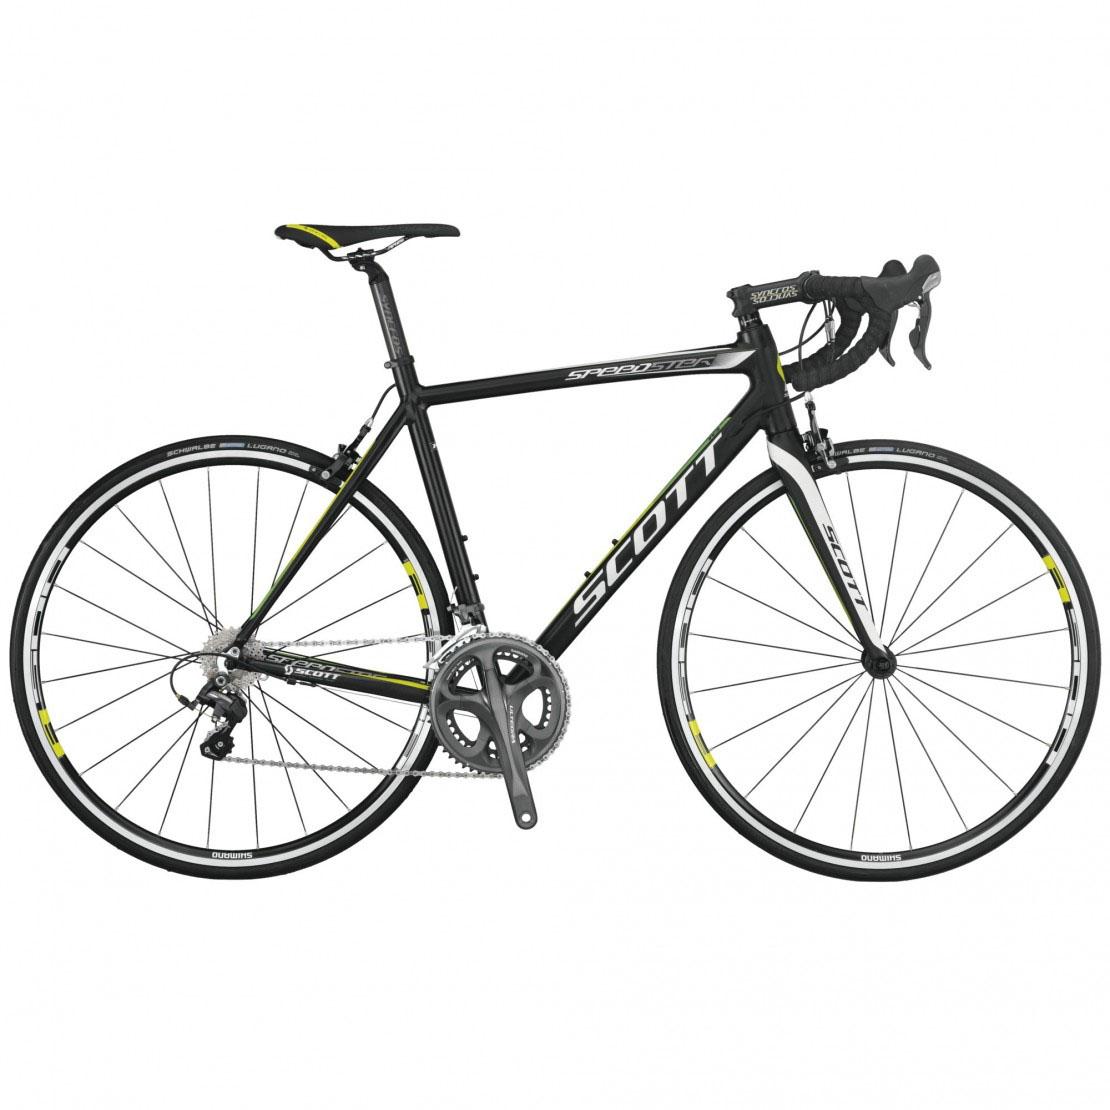 Scott Speedster 10 2014 Road Bike